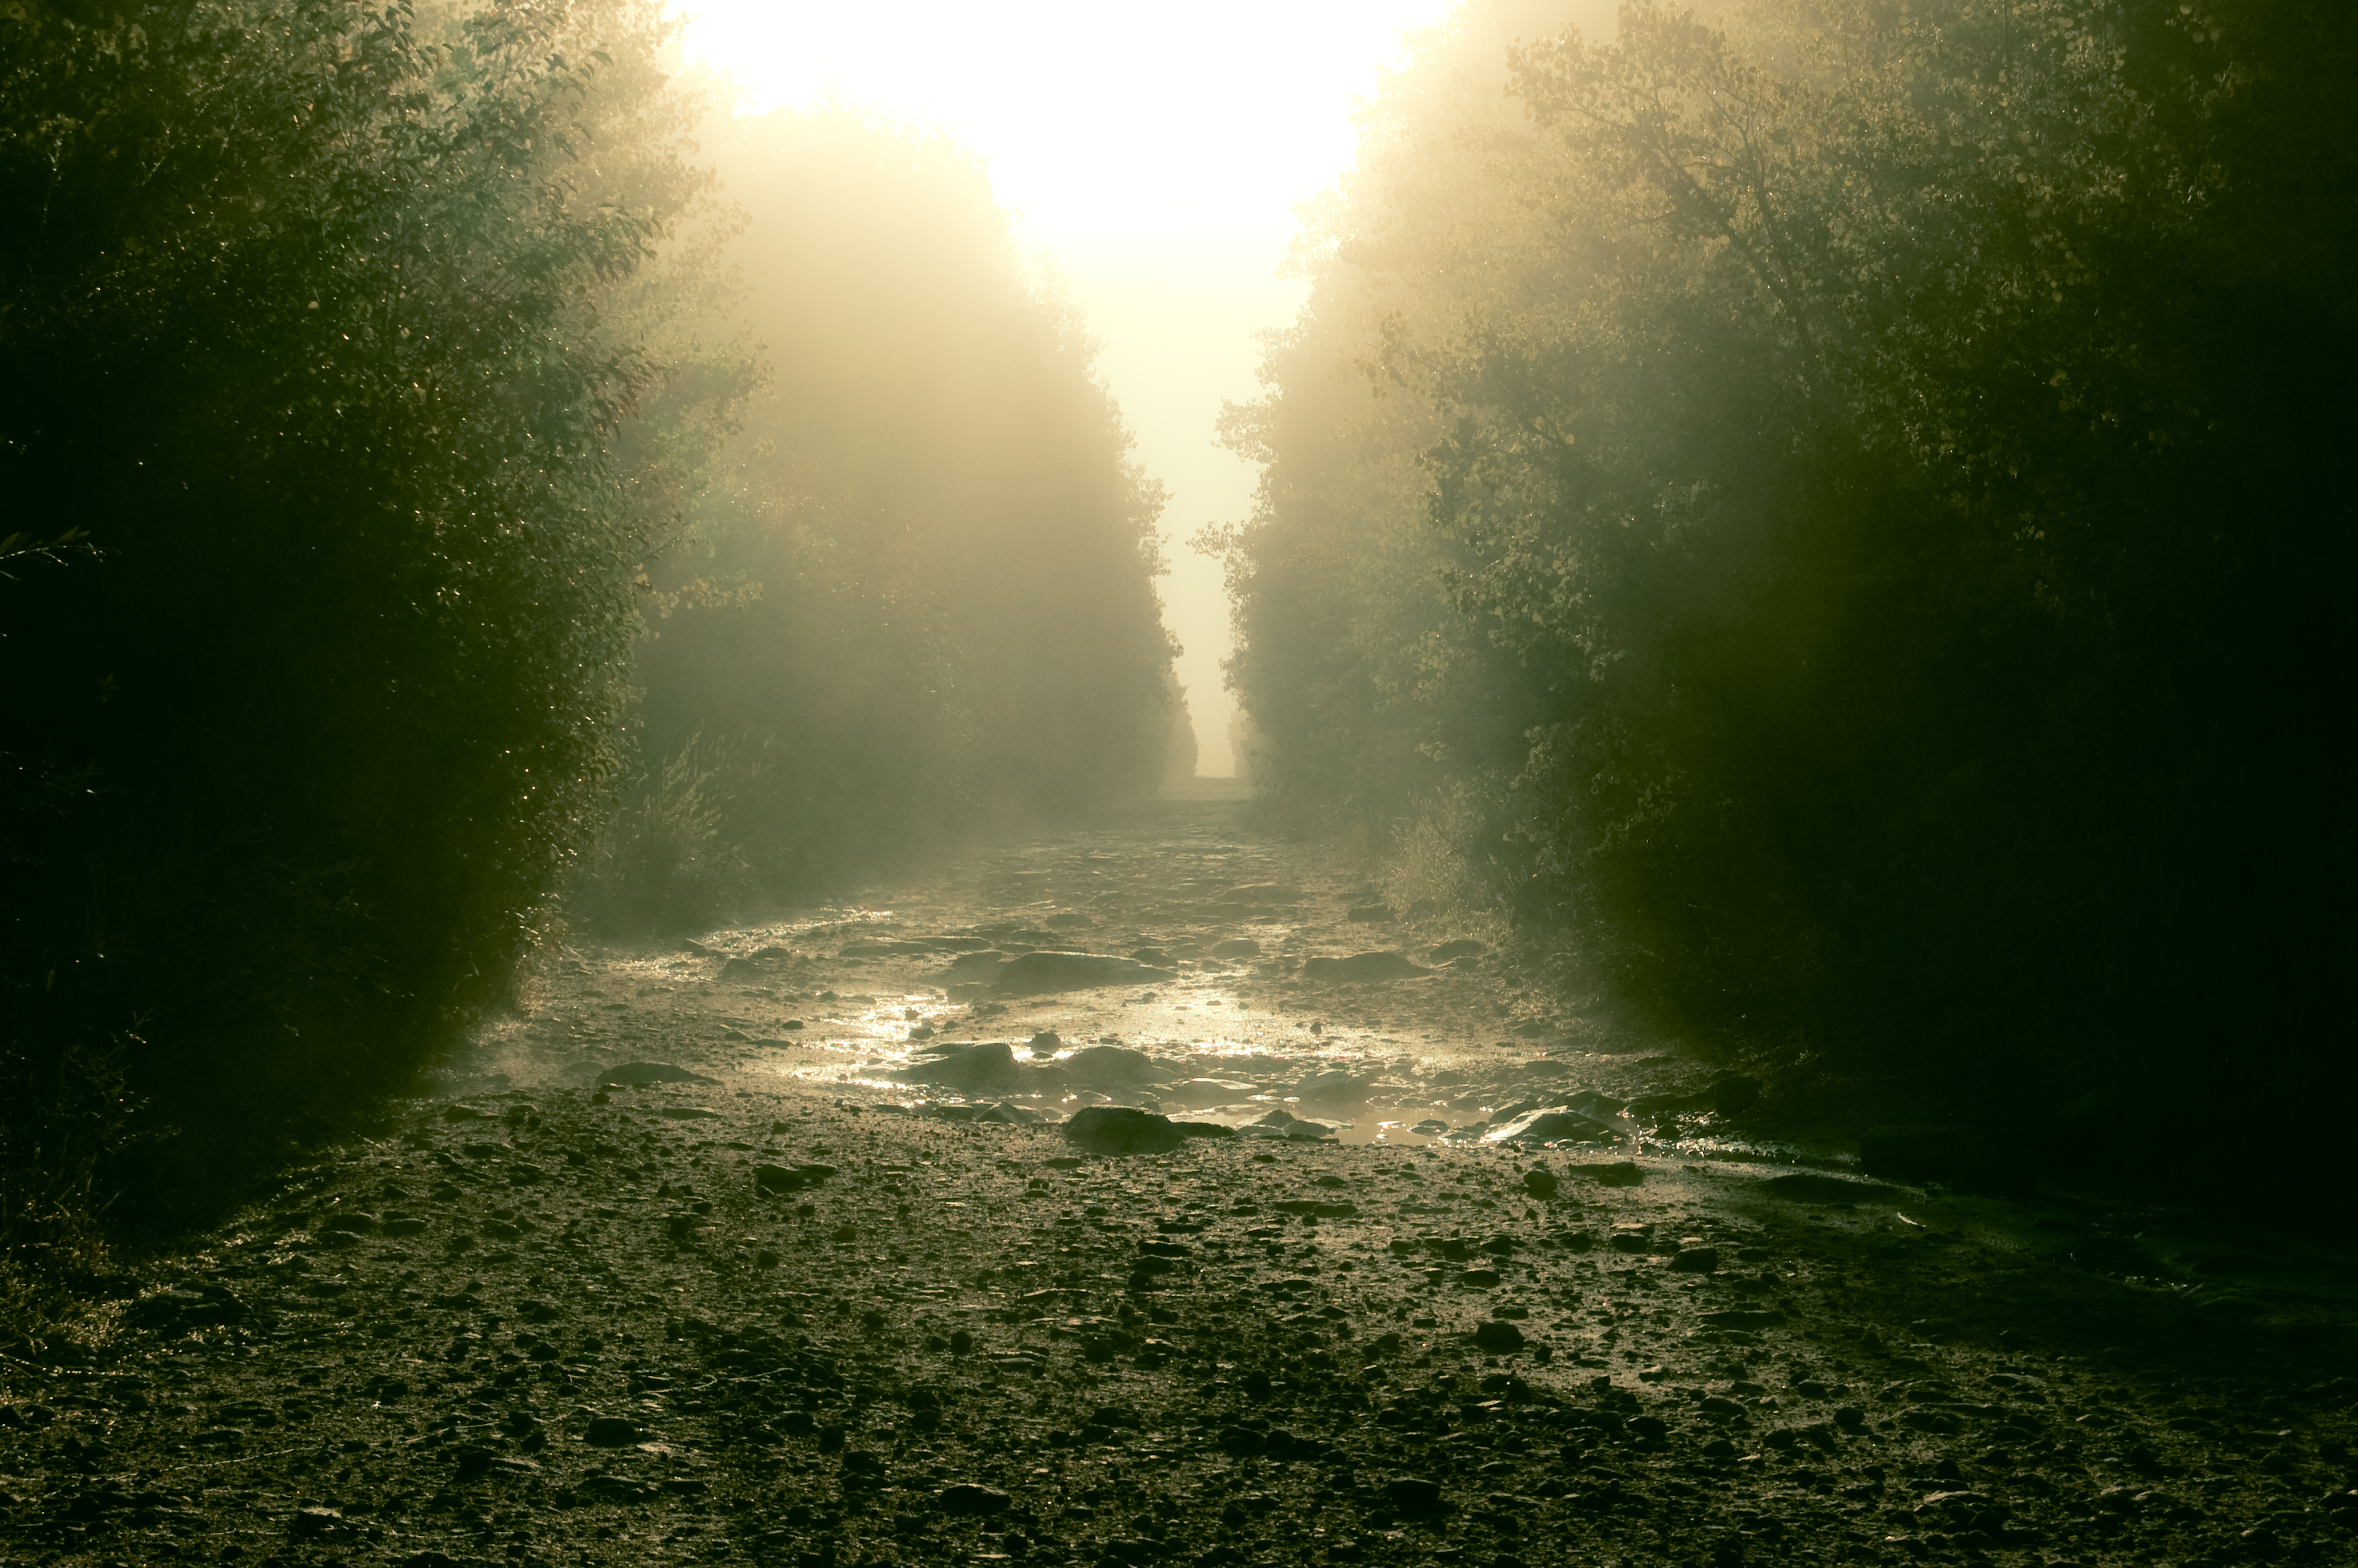 Sunrise forex mg road